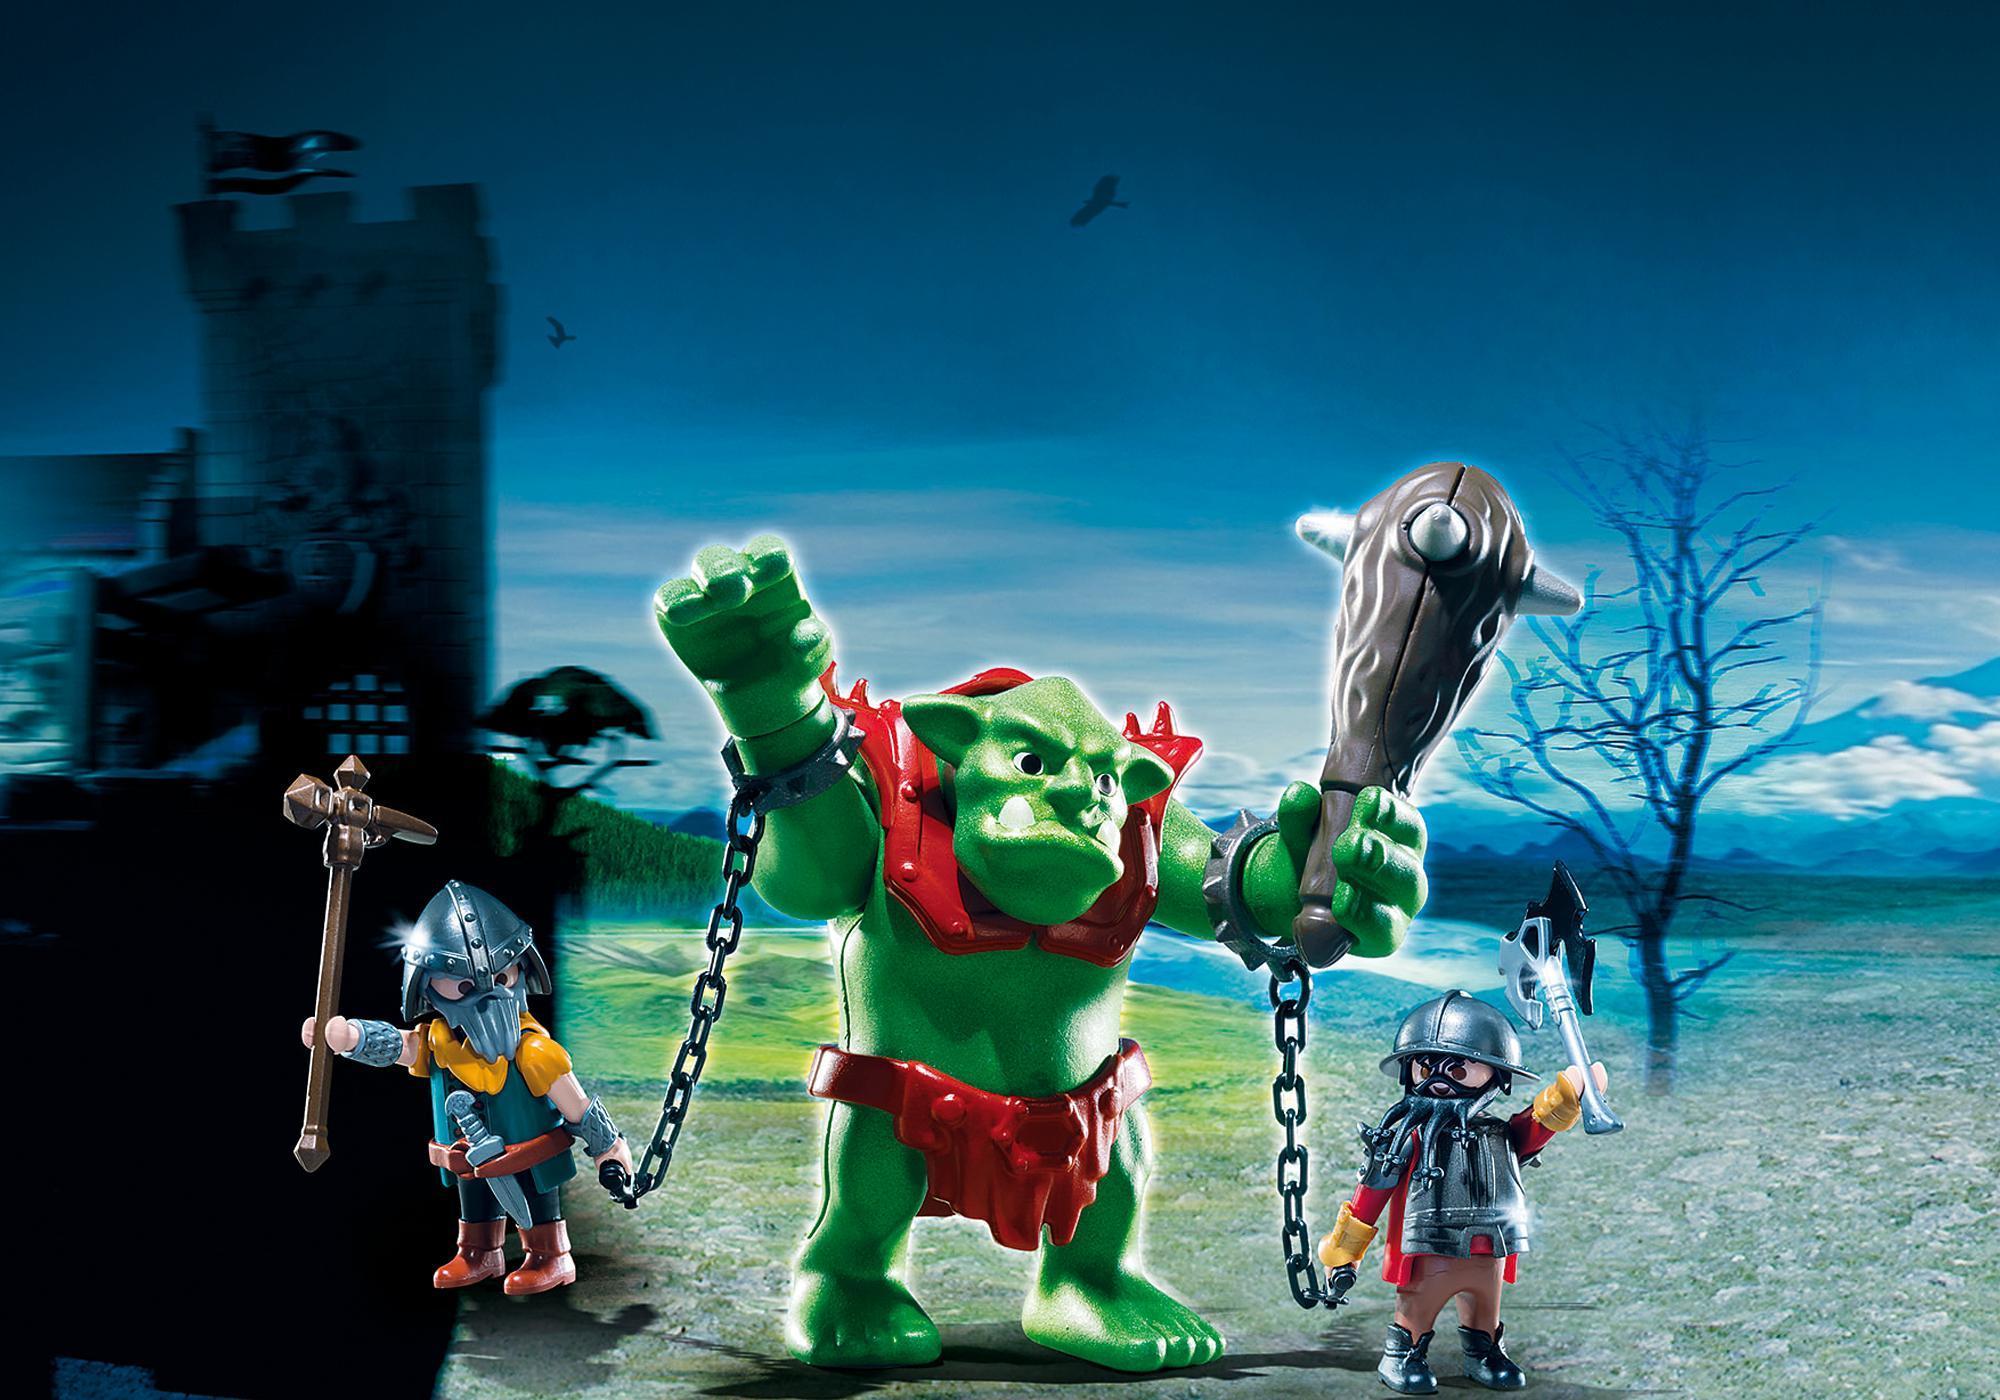 http://media.playmobil.com/i/playmobil/6004_product_detail/Рыцари: Гигантский троль и боевые гномы